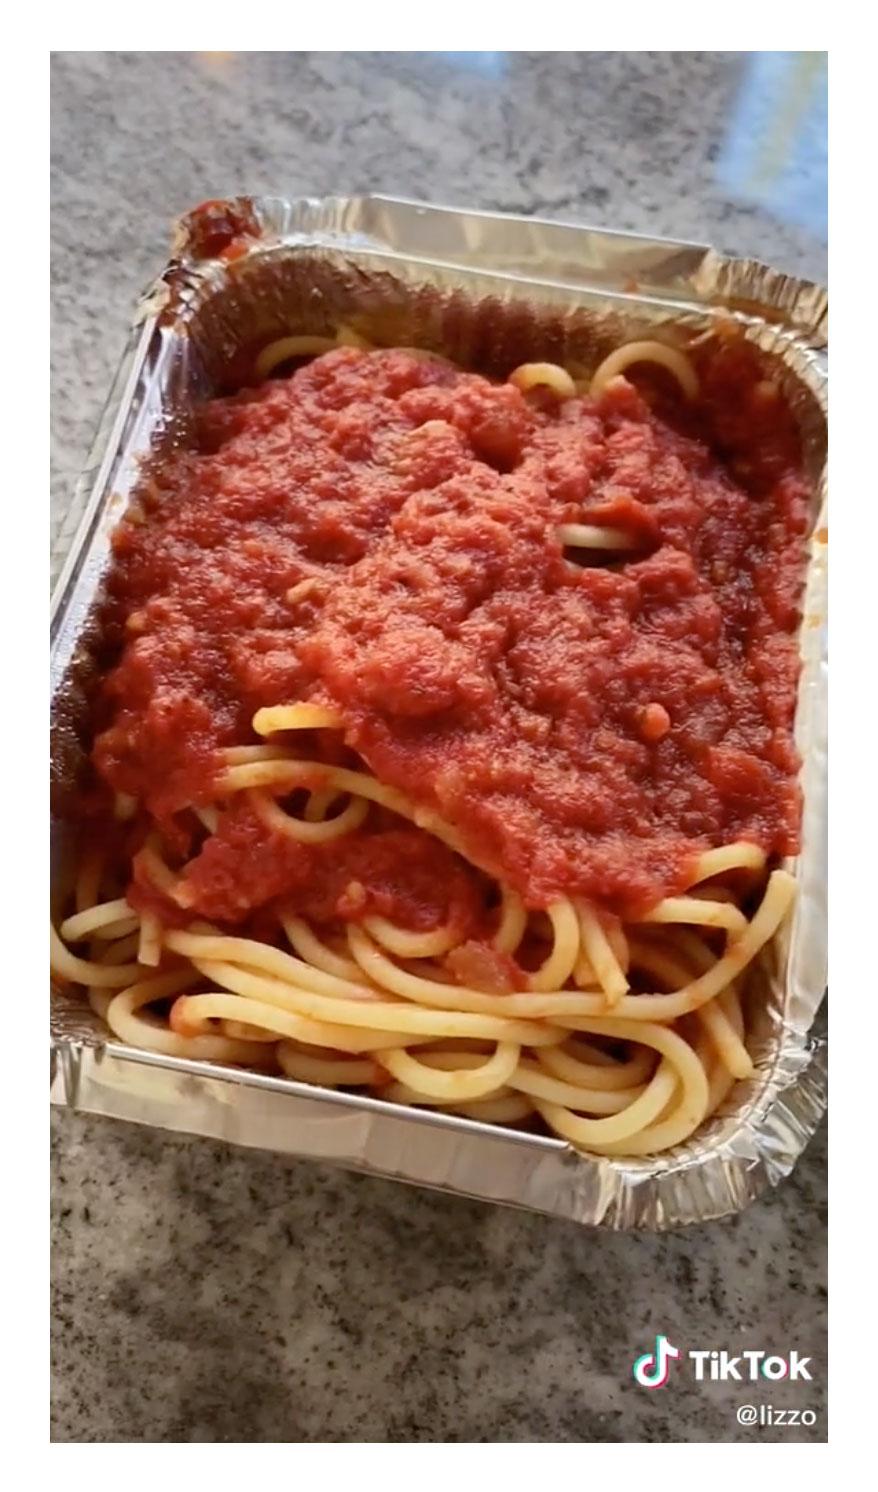 Noodles Lizzo Reveals More of Her Favorite Vegan Eats TikTok